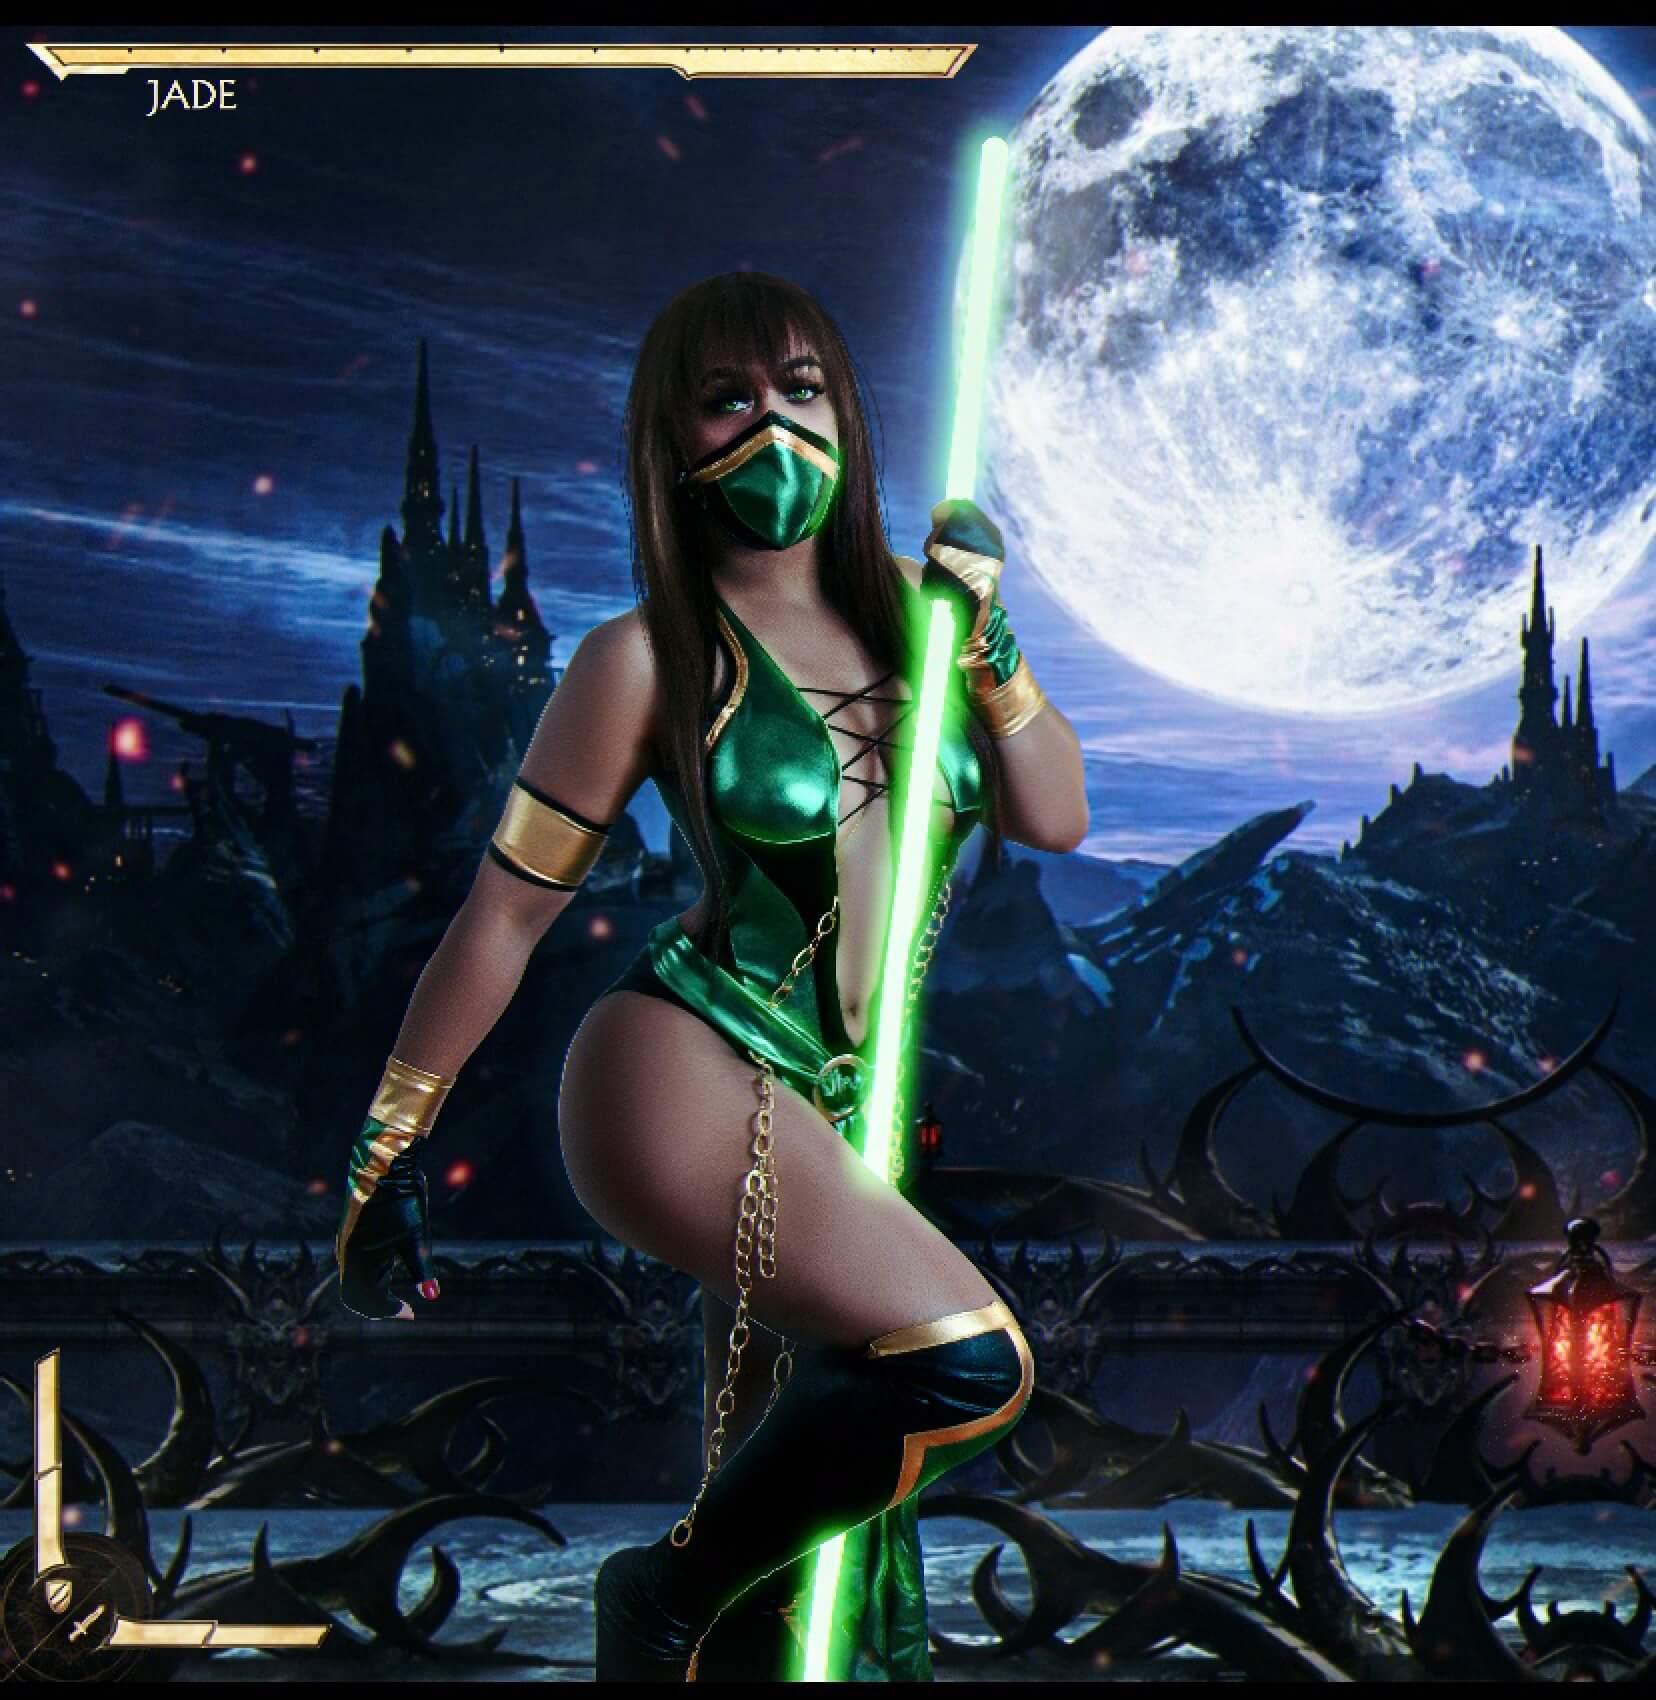 Briana-Amerson-cosplay-outfit-Psychokittykatgaming-2